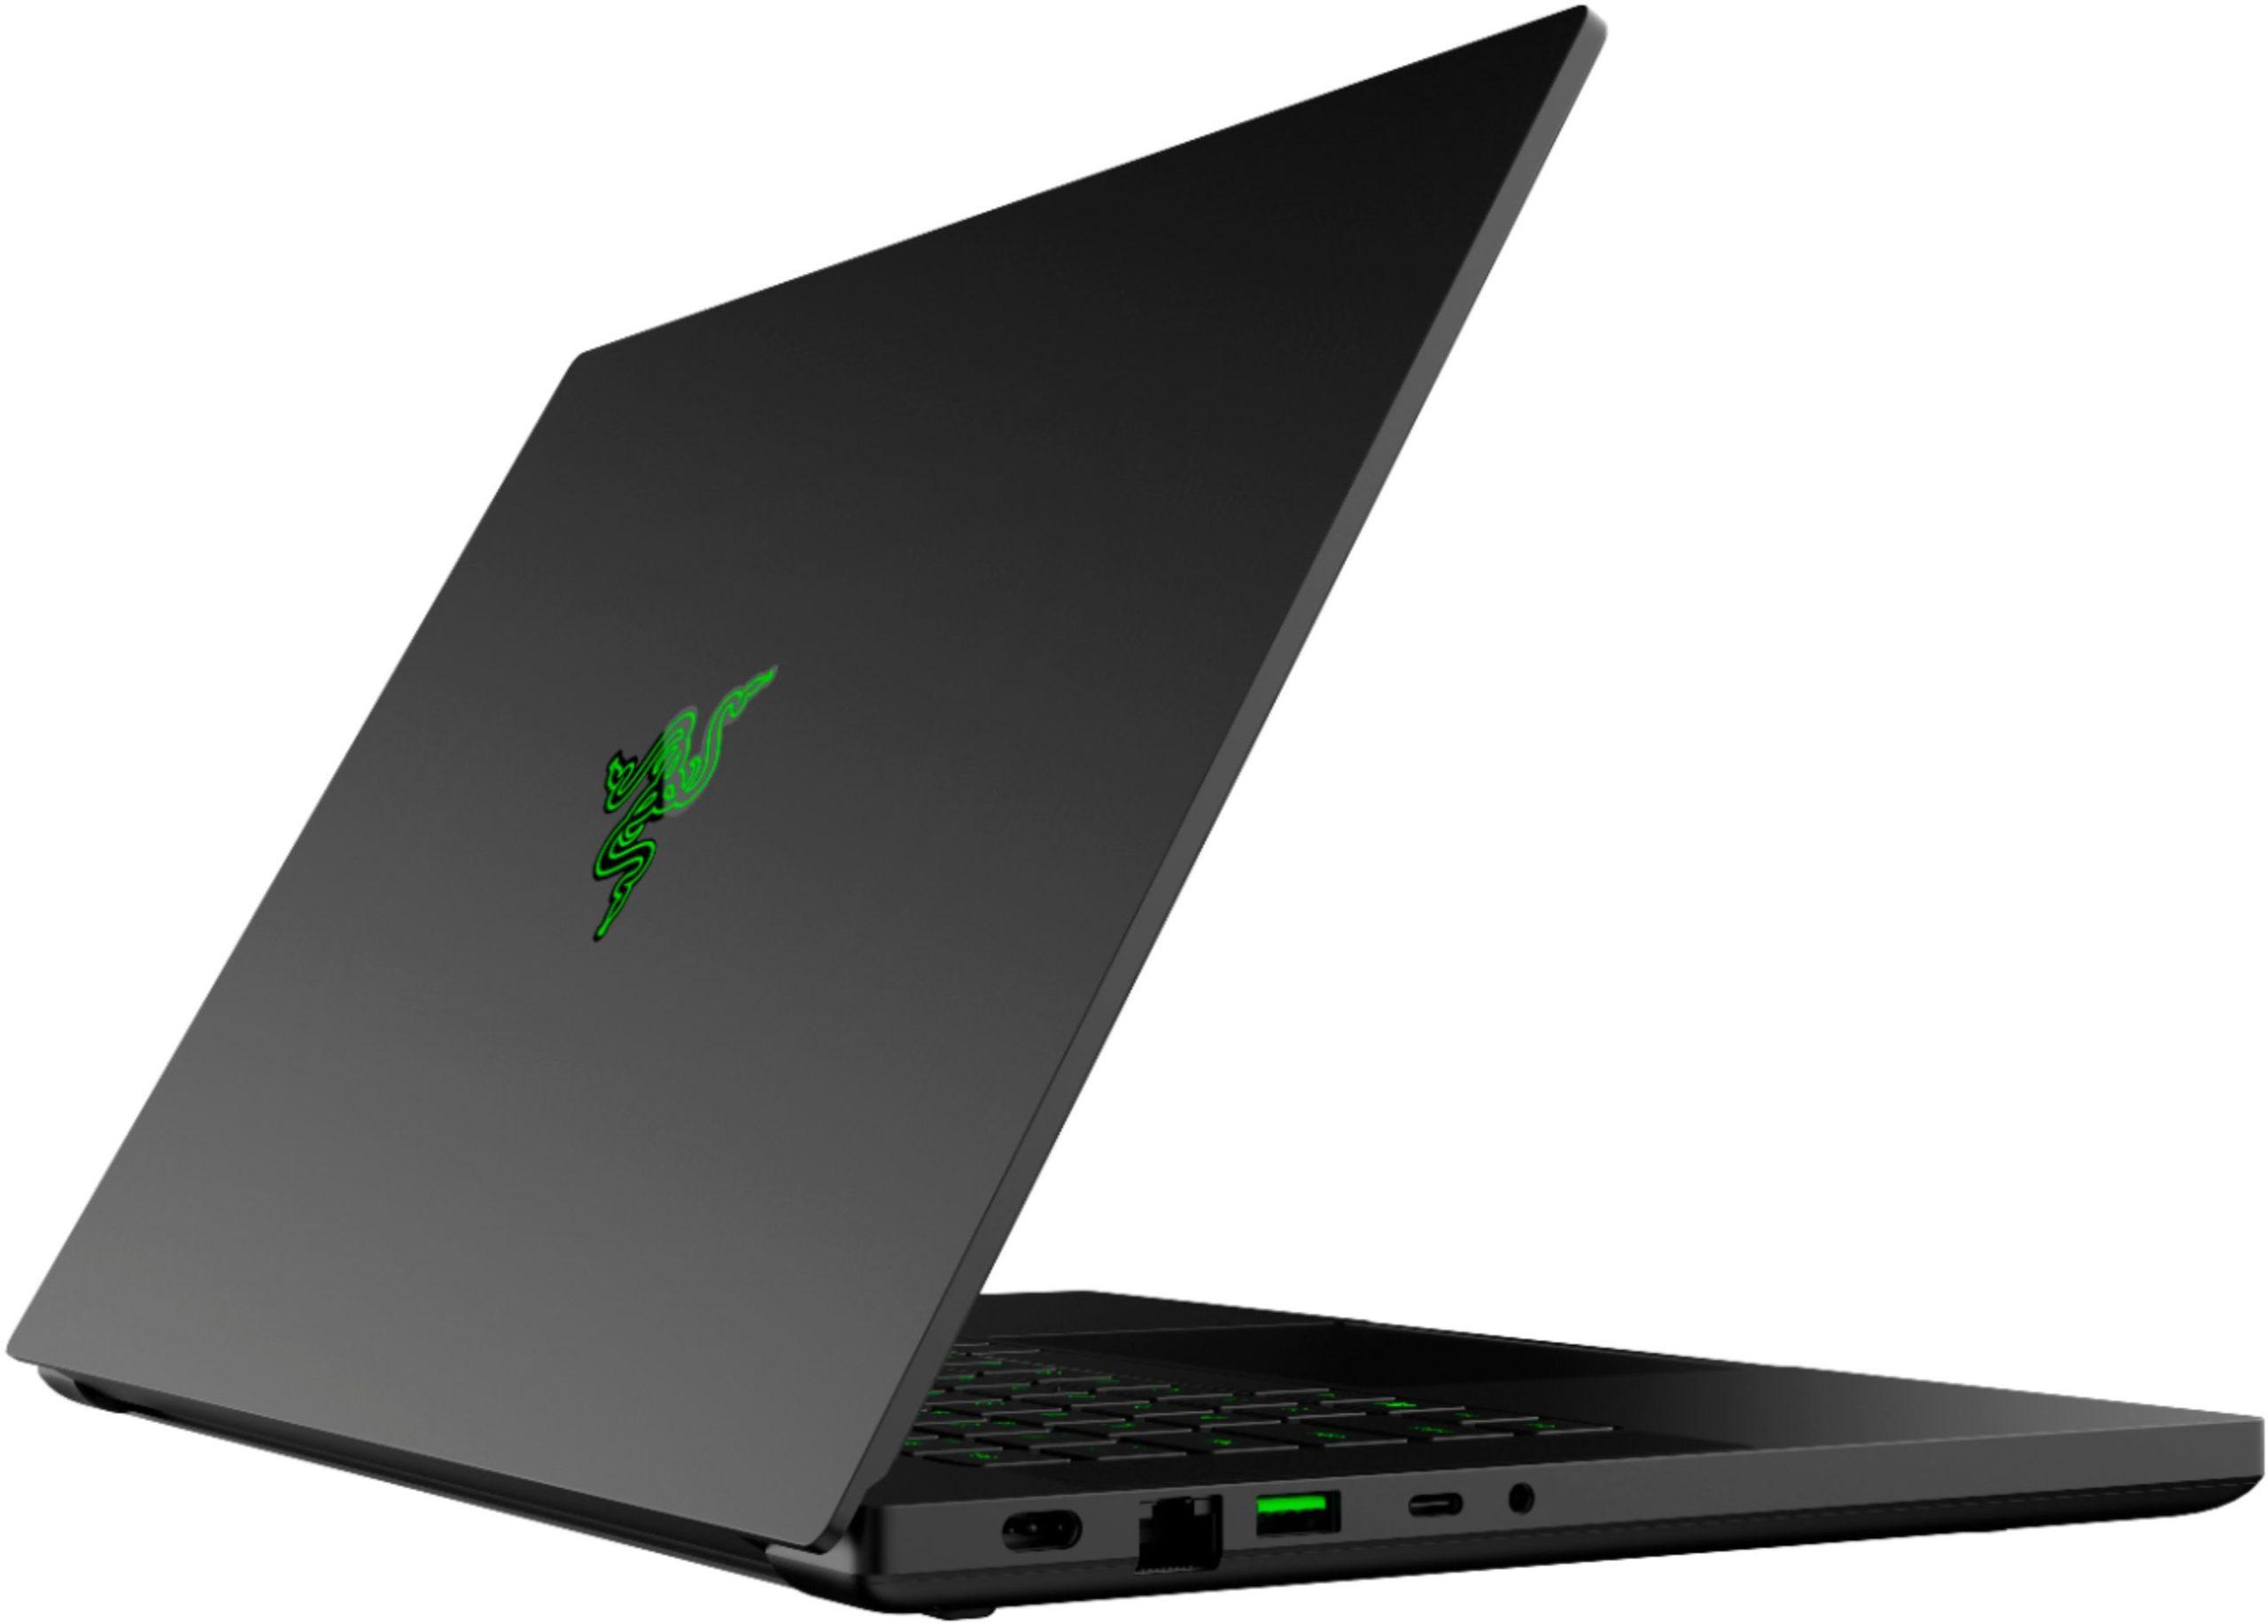 Ноутбук Razer Blade Base 15 (RZ09-03286E22-R3U1)  - 4